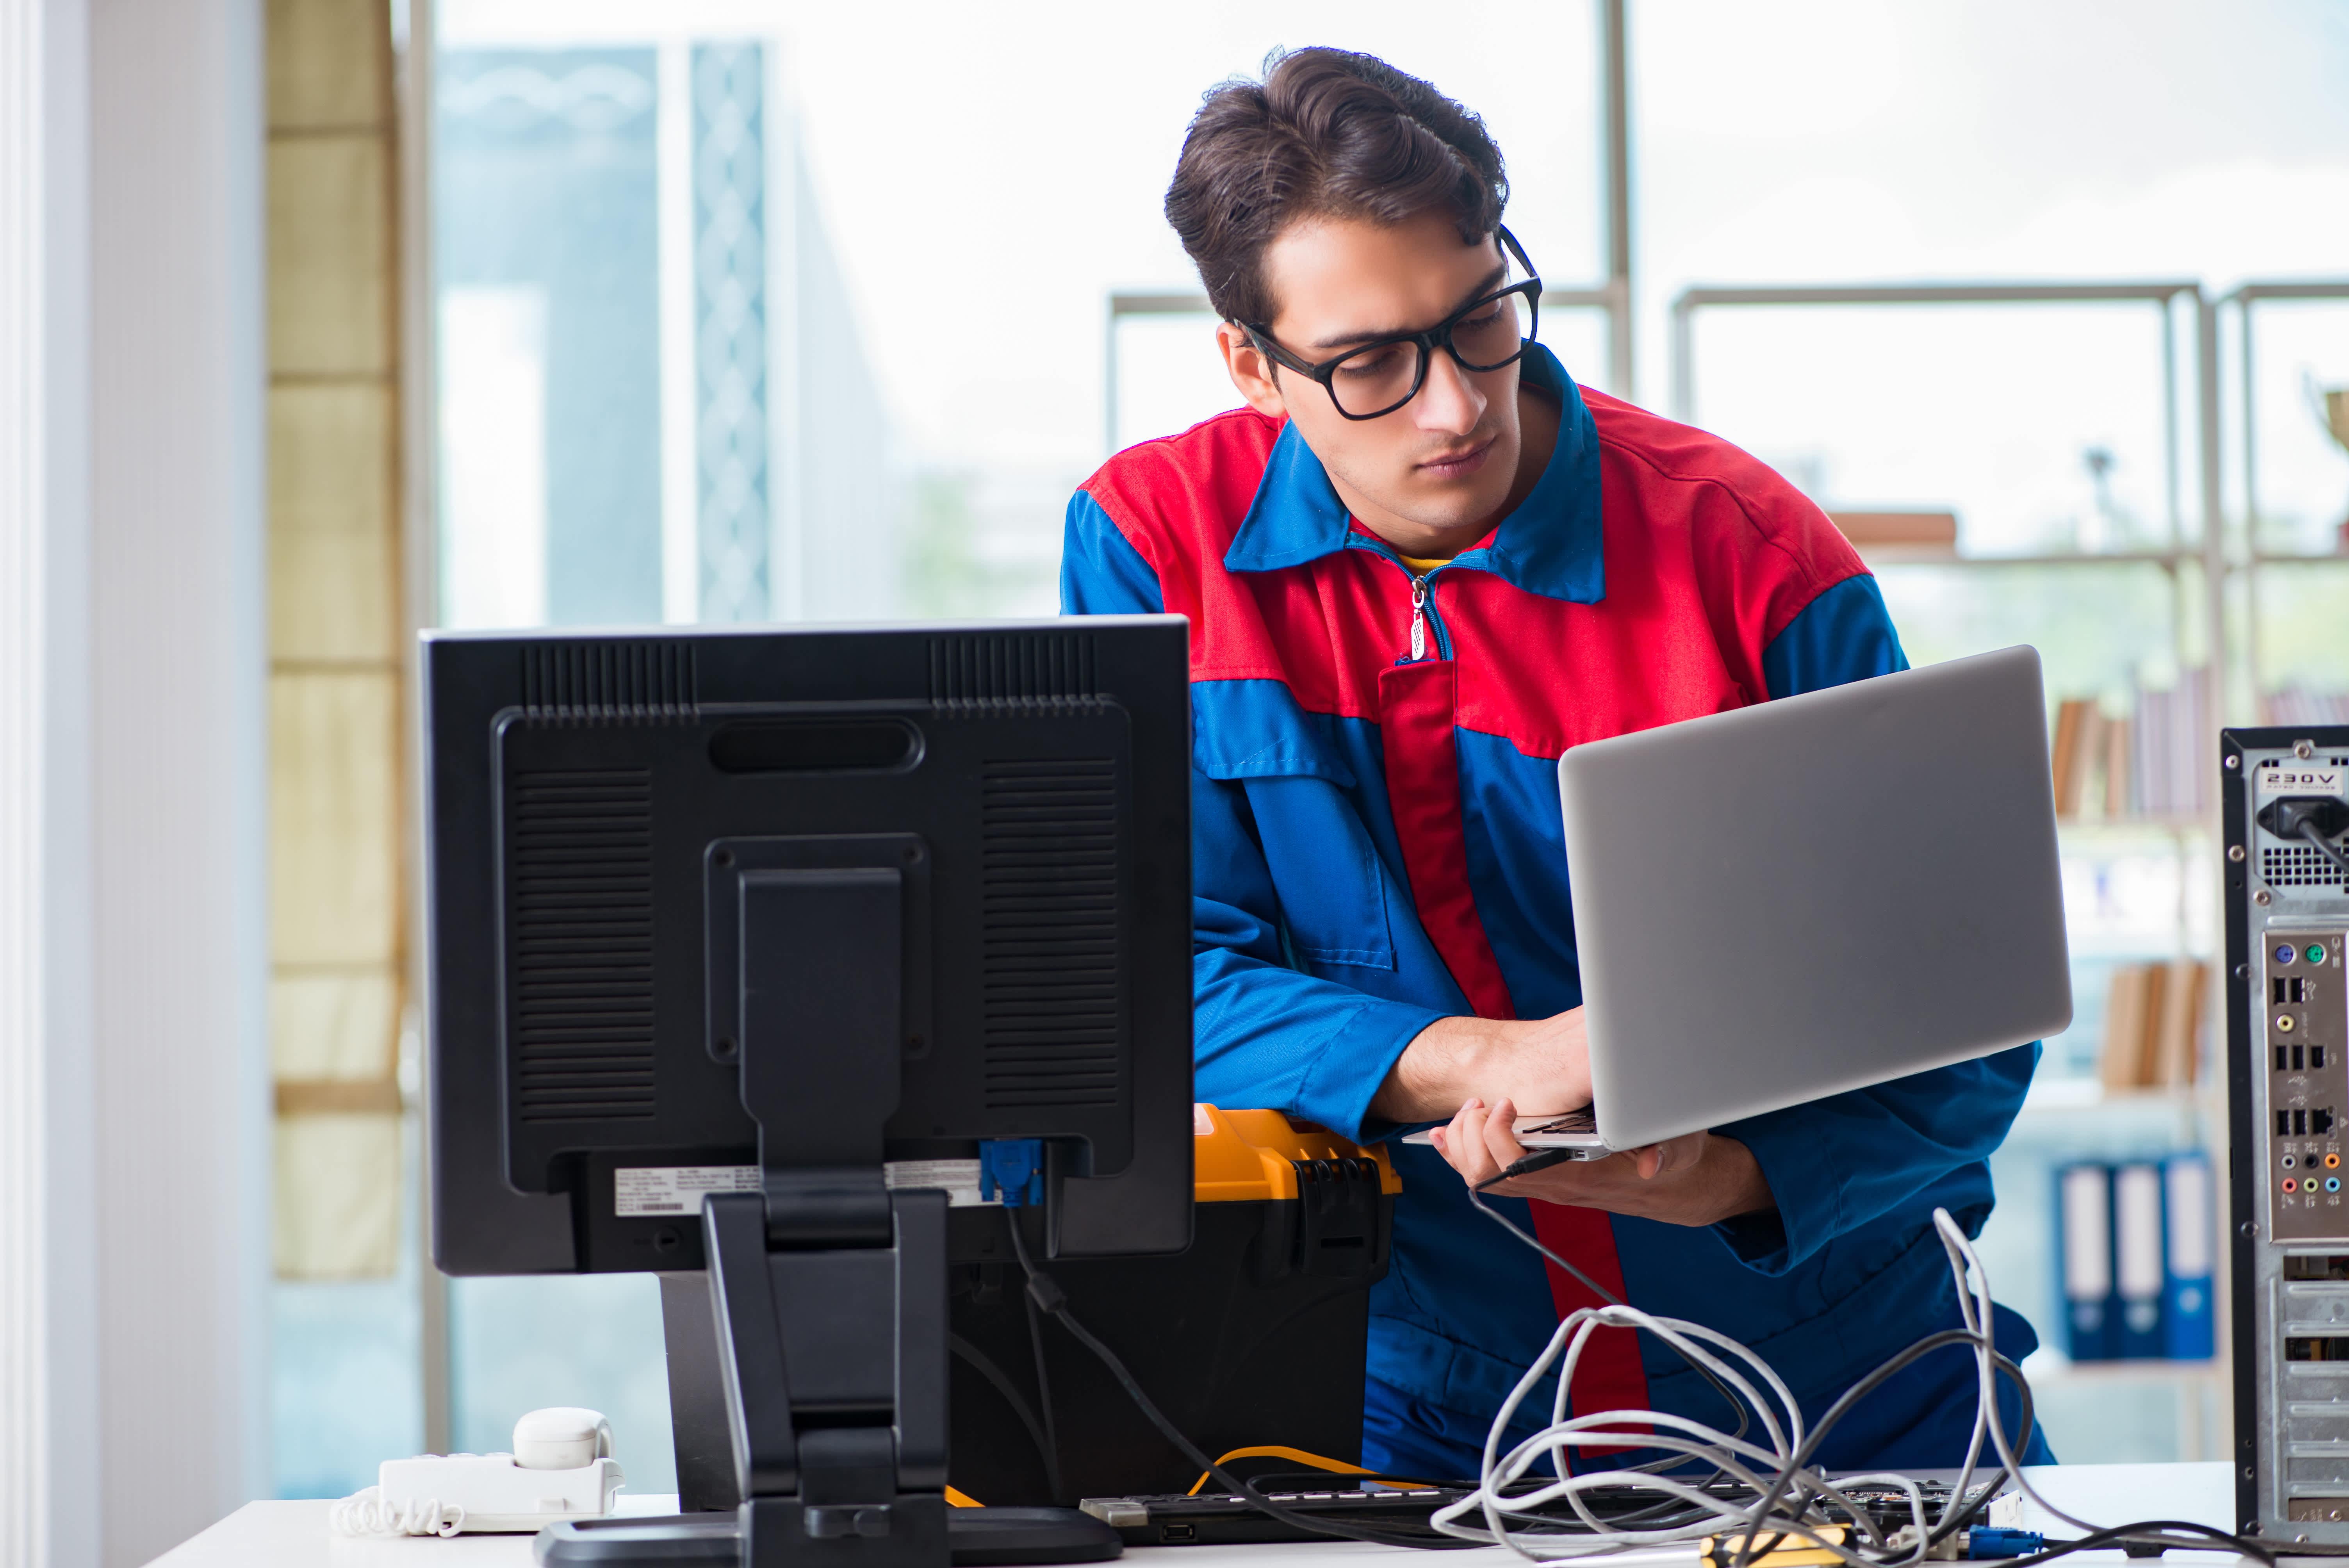 New PC Set-Up & Data Transfer